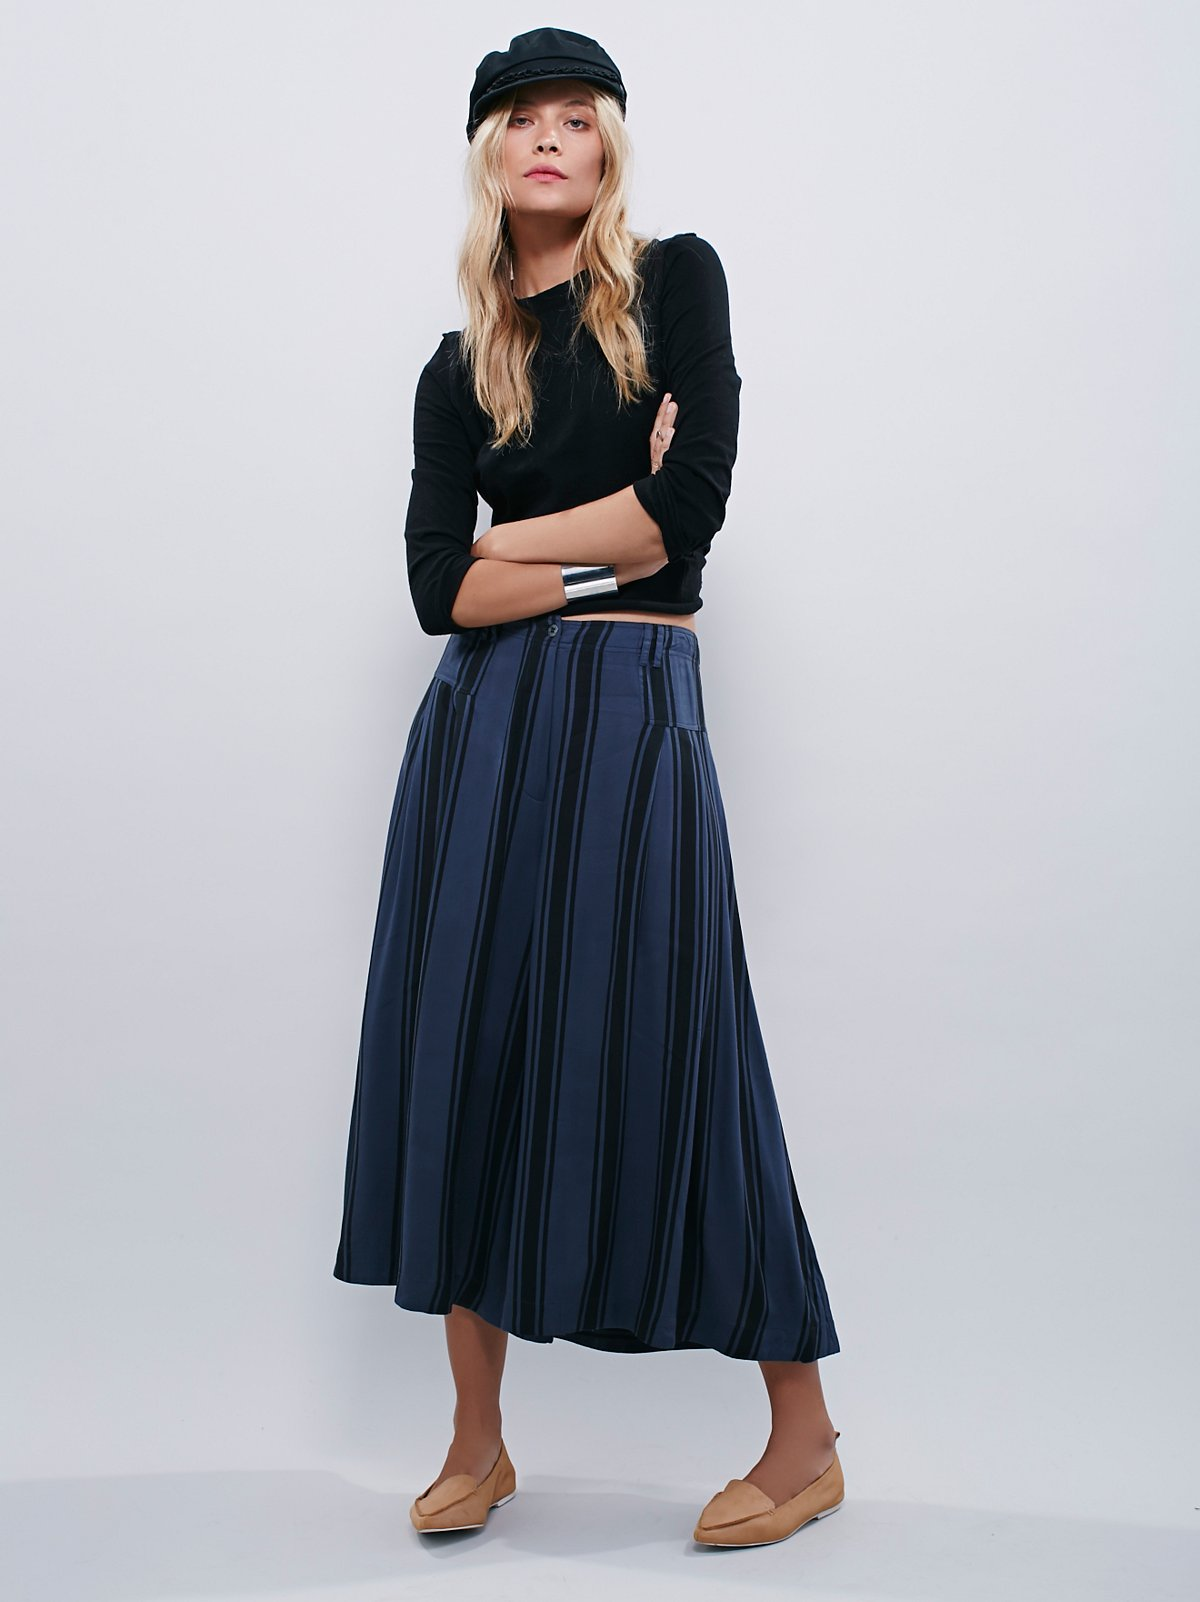 So Good条纹裙裤